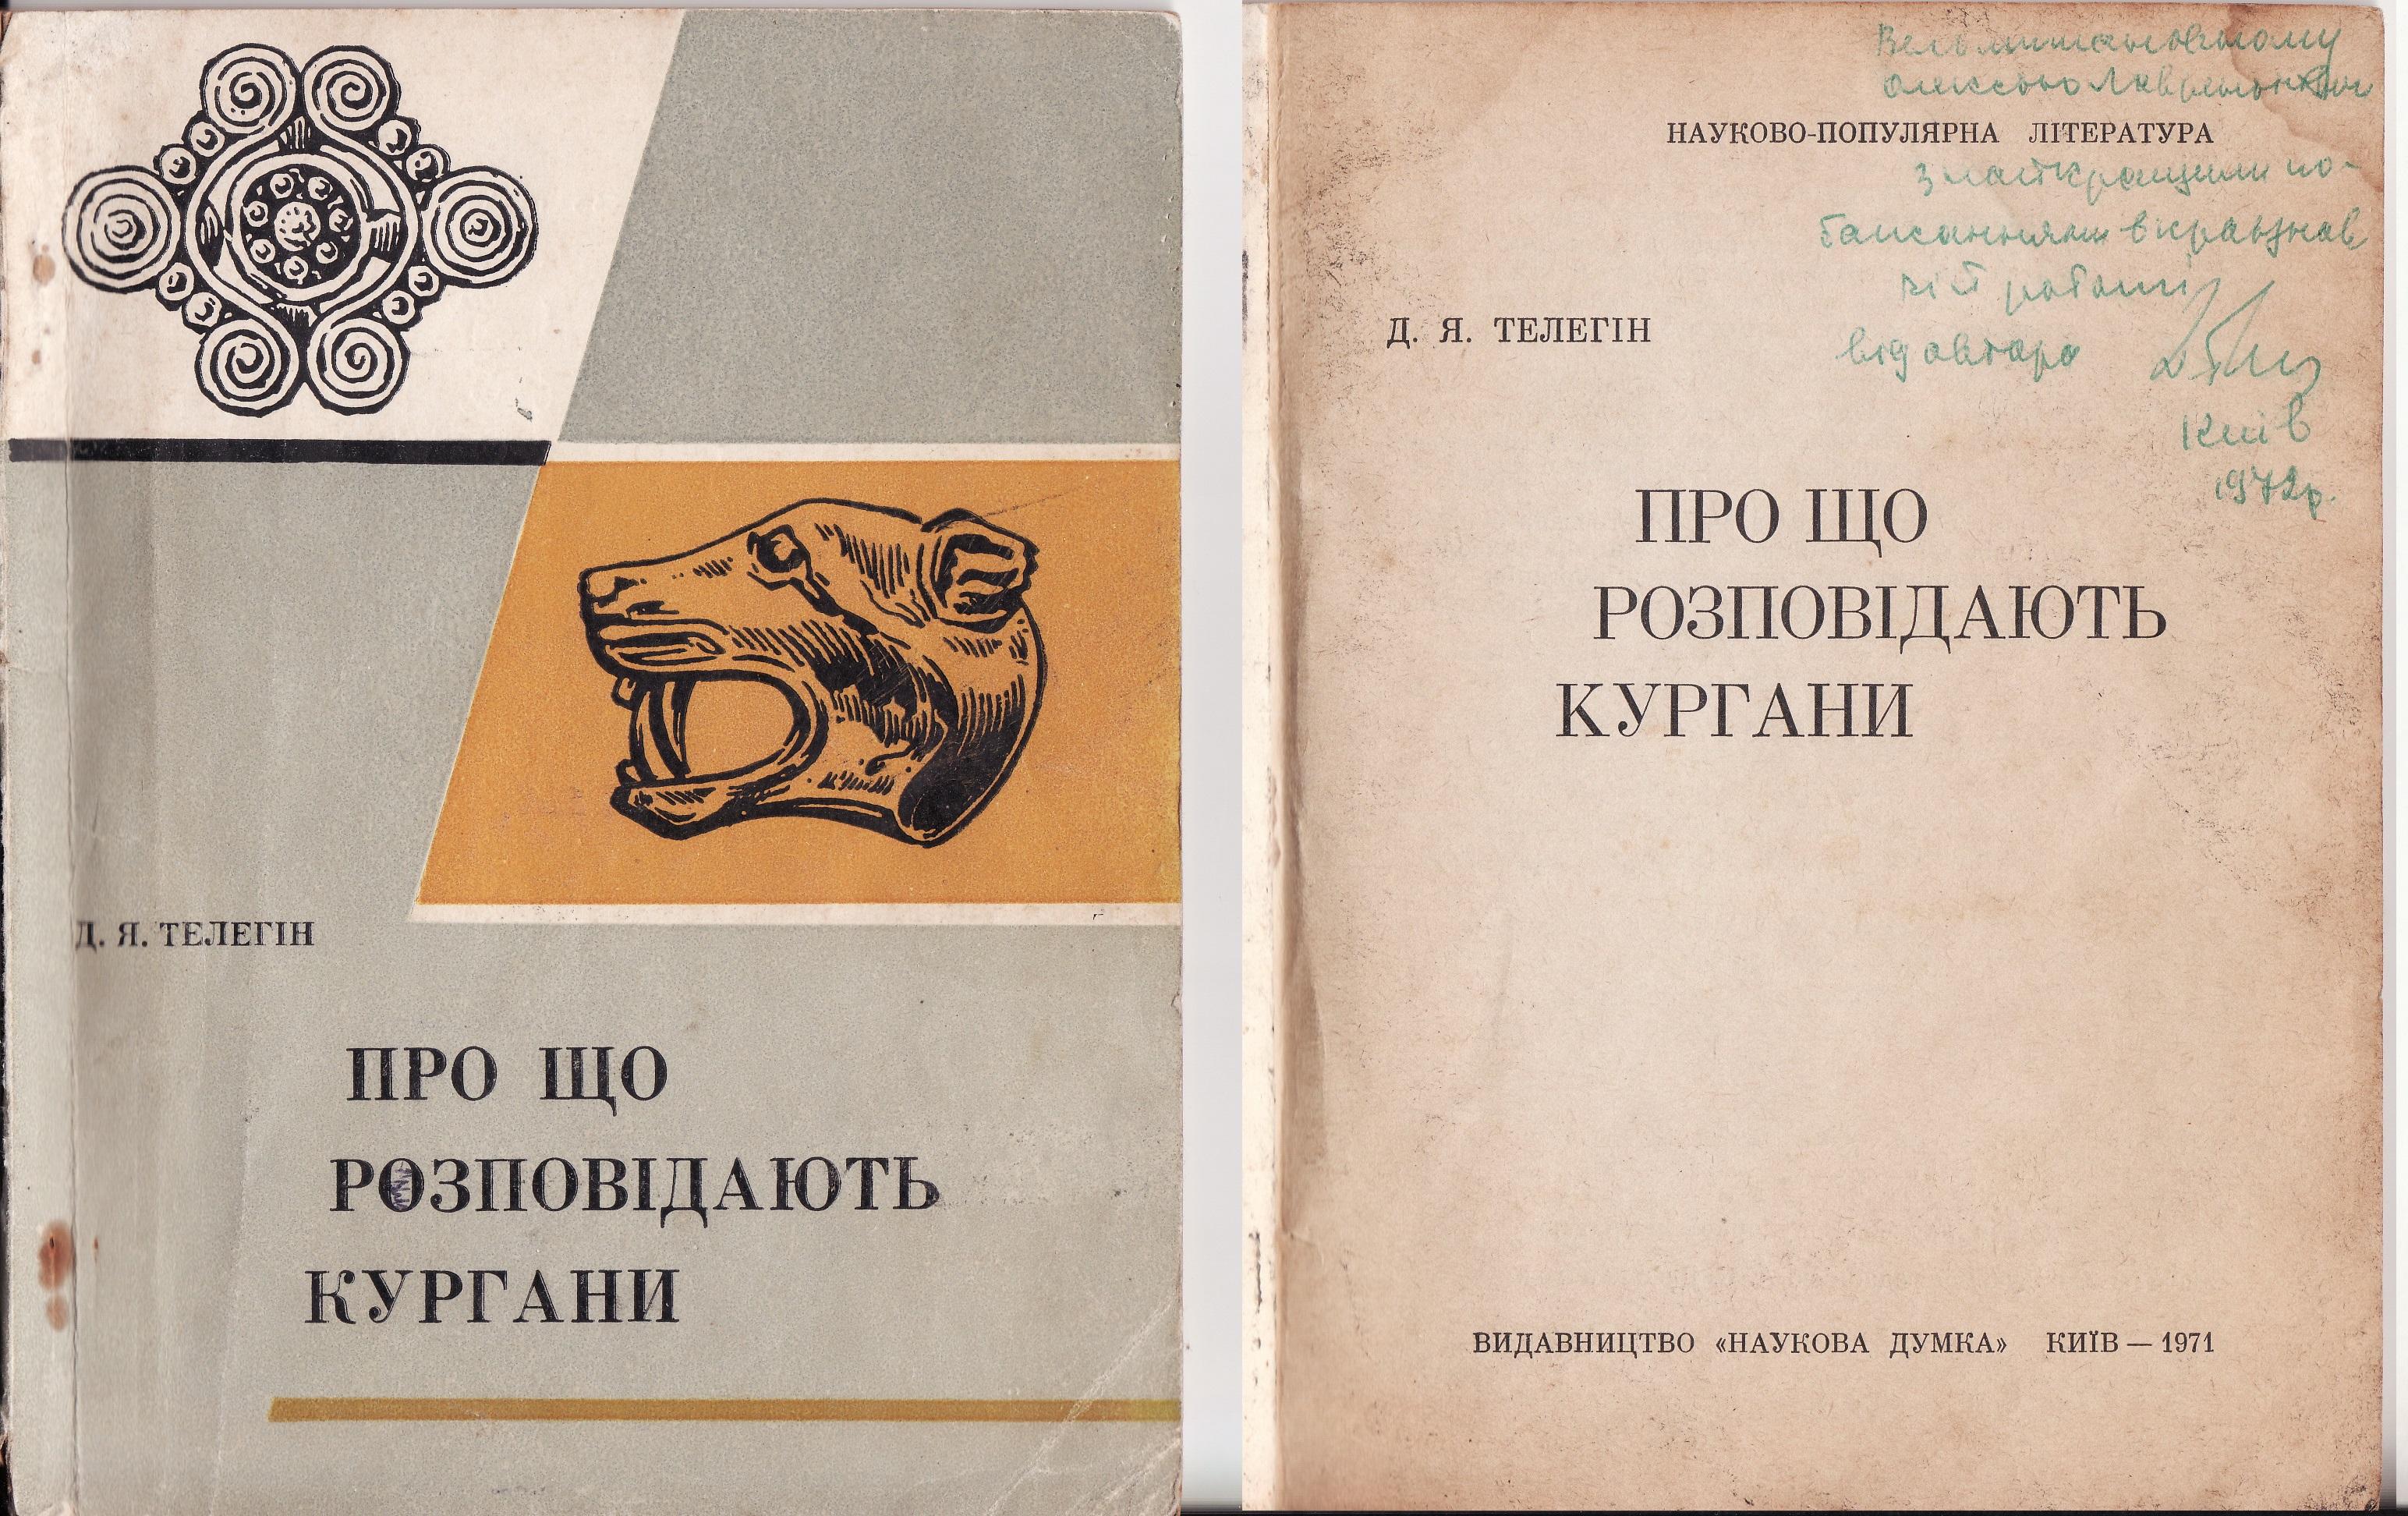 http://images.vfl.ru/ii/1592990097/47001946/30893477.jpg